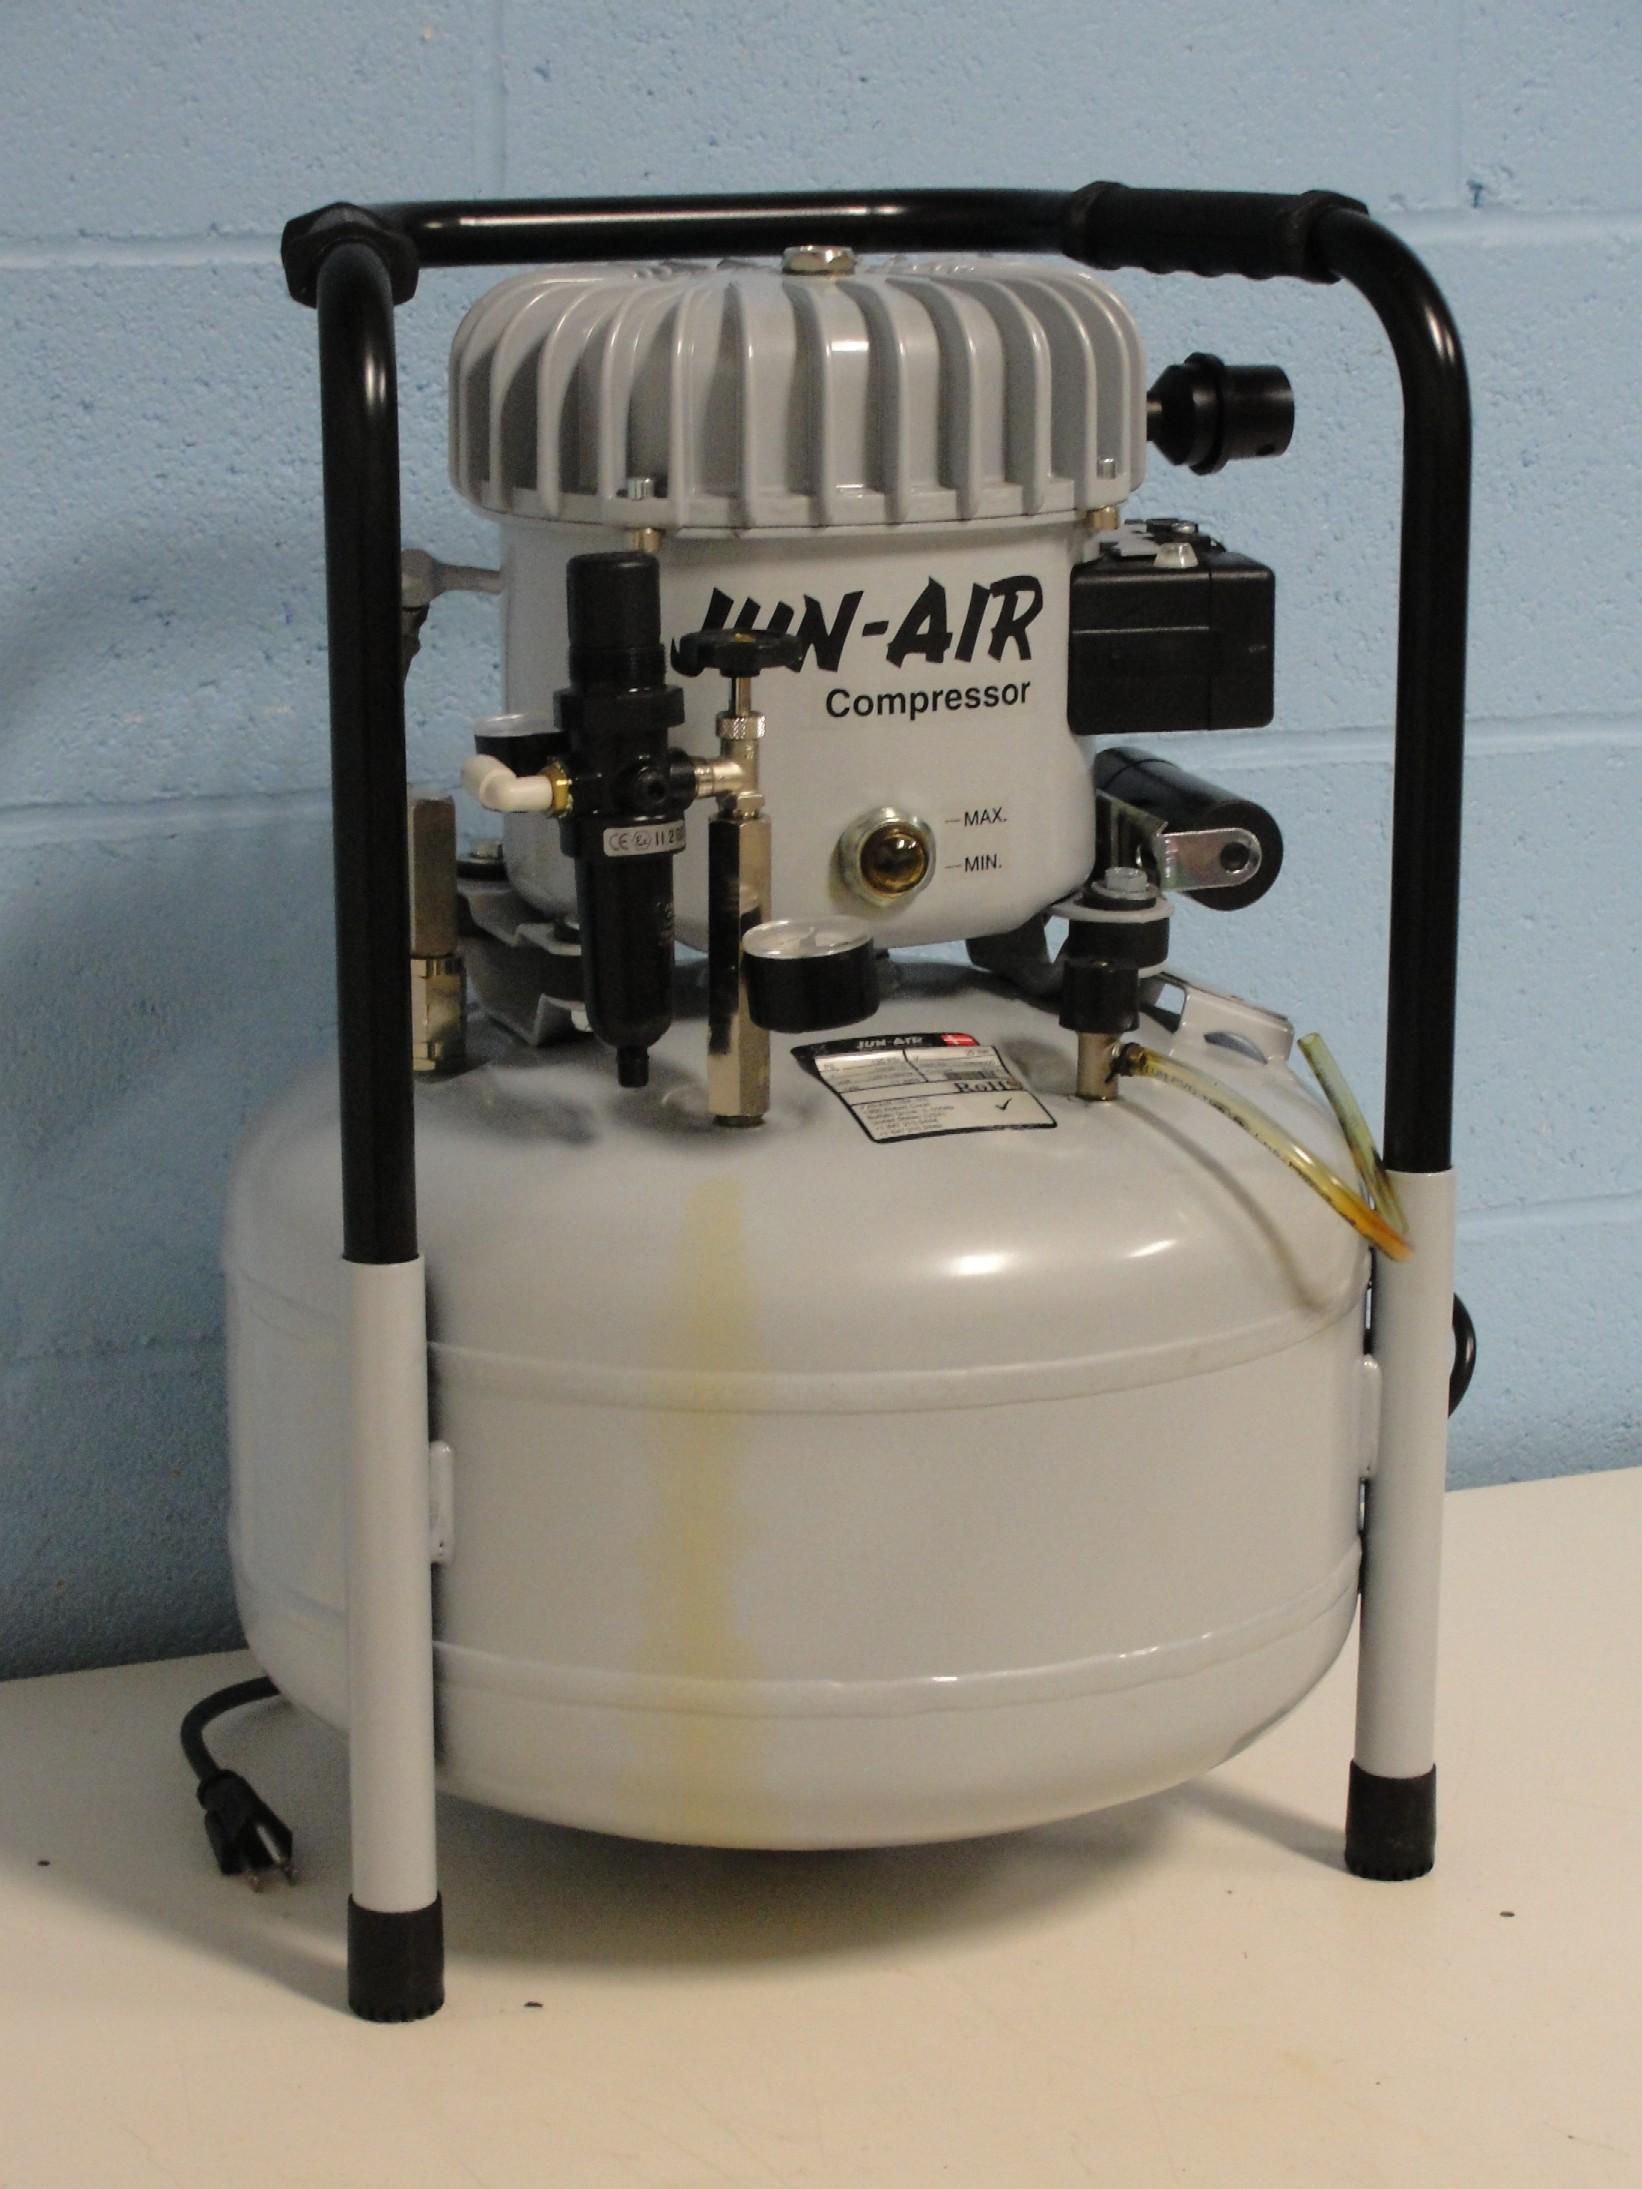 hight resolution of jun air model 6 25 compressor image